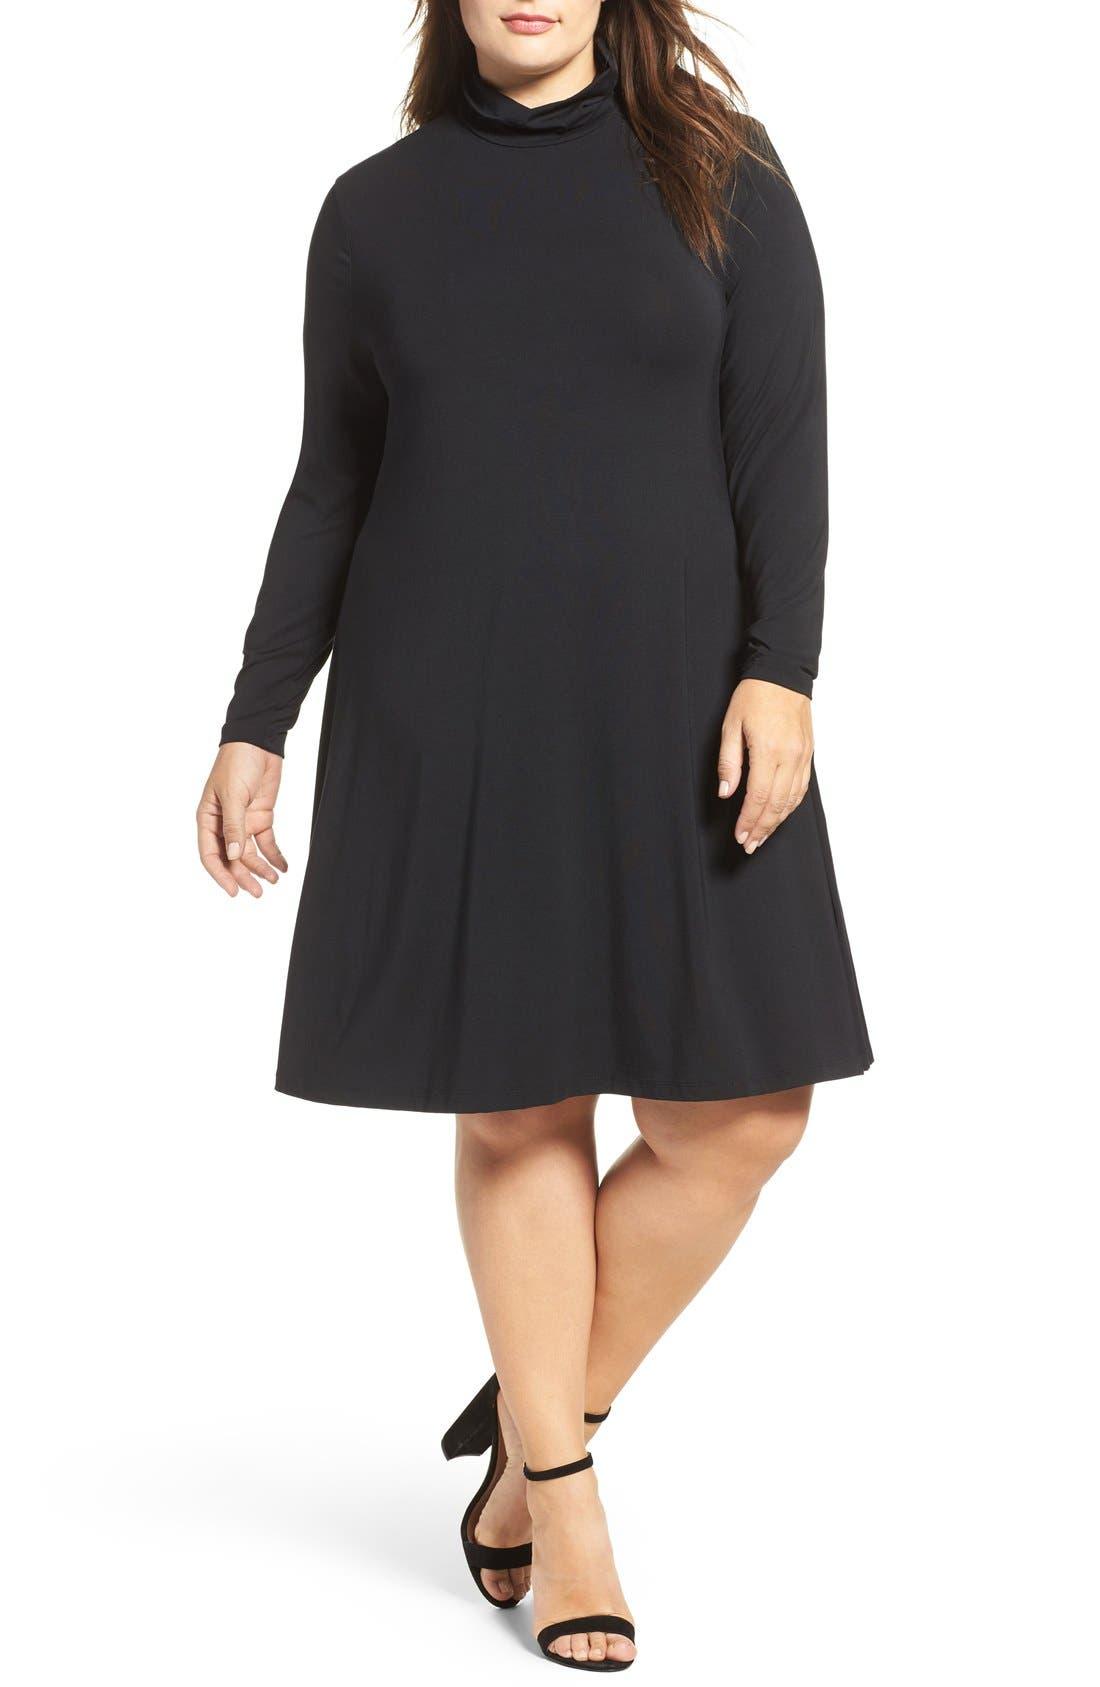 Sally Turtleneck A-Line Dress,                             Main thumbnail 1, color,                             Black